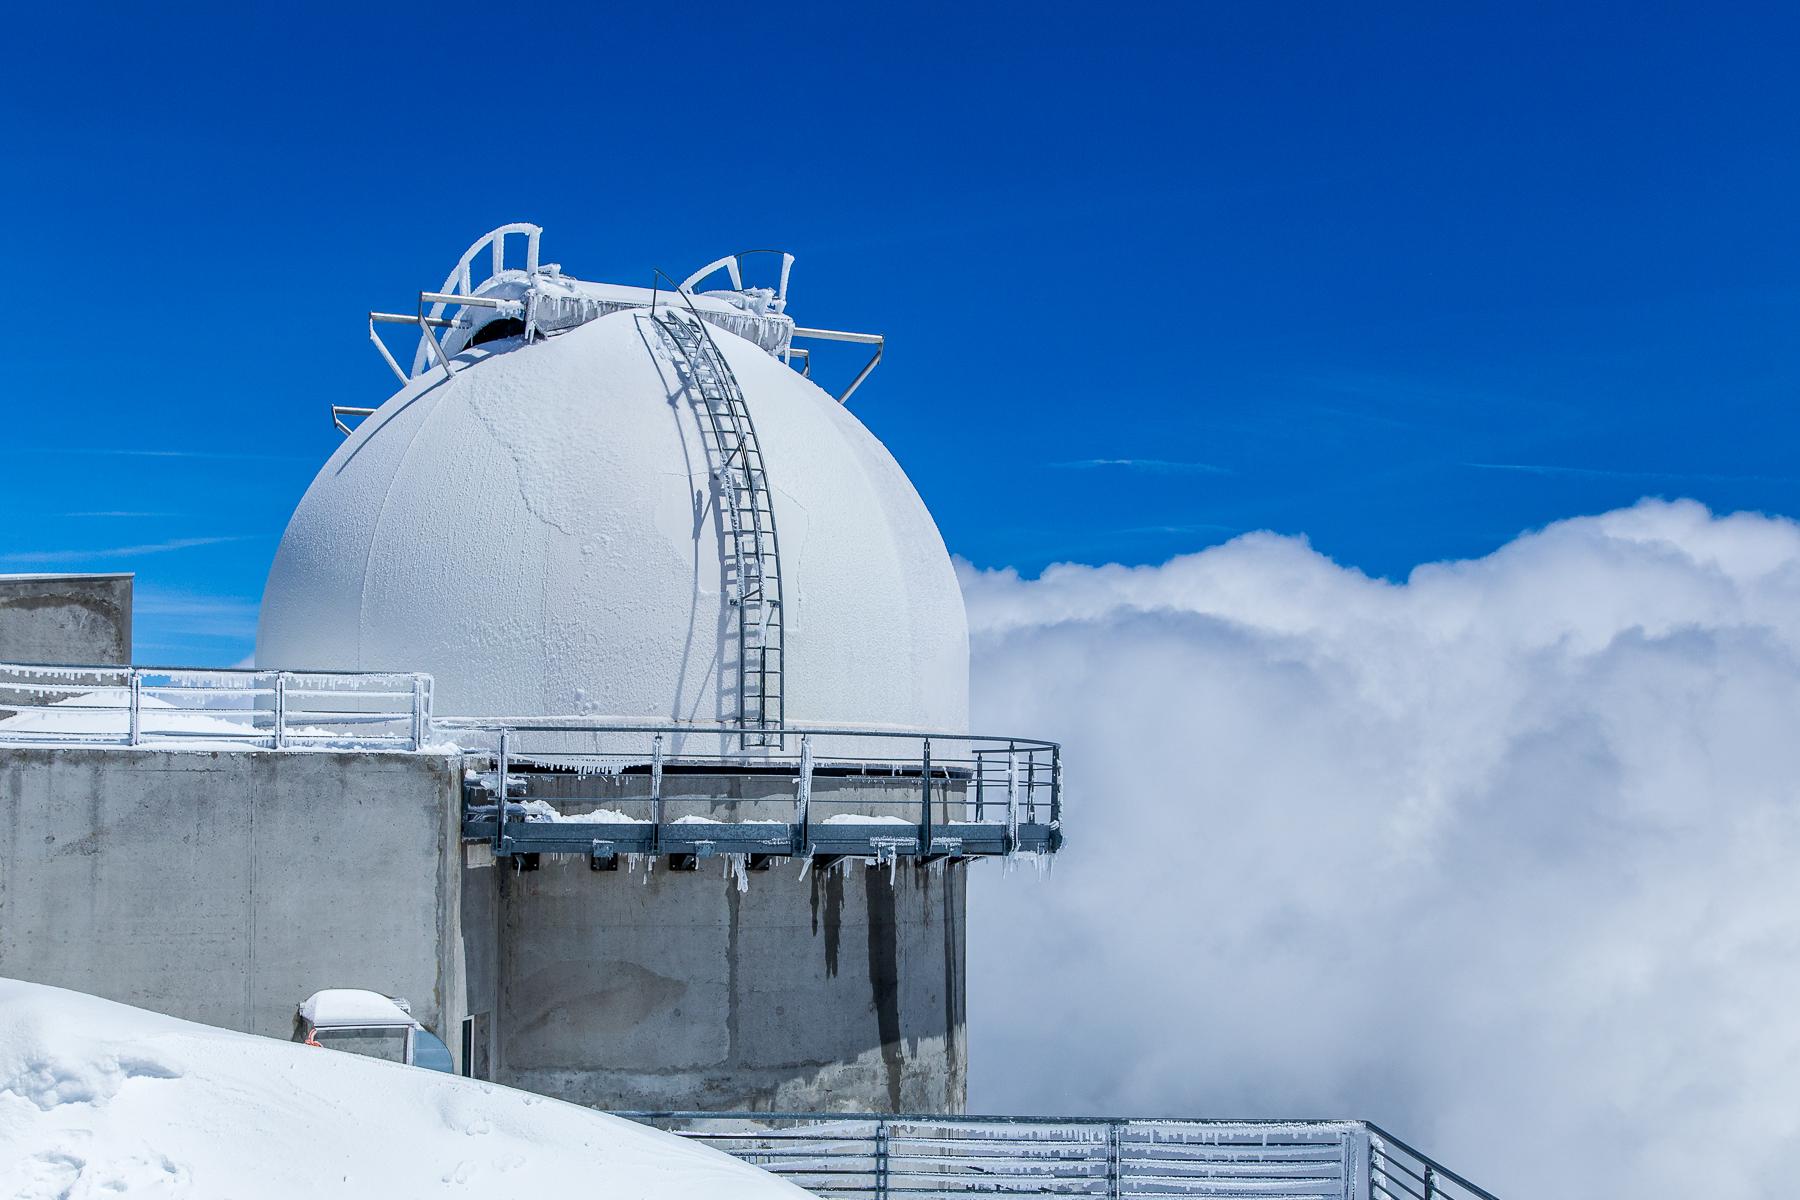 Telescope at Pic du Midi